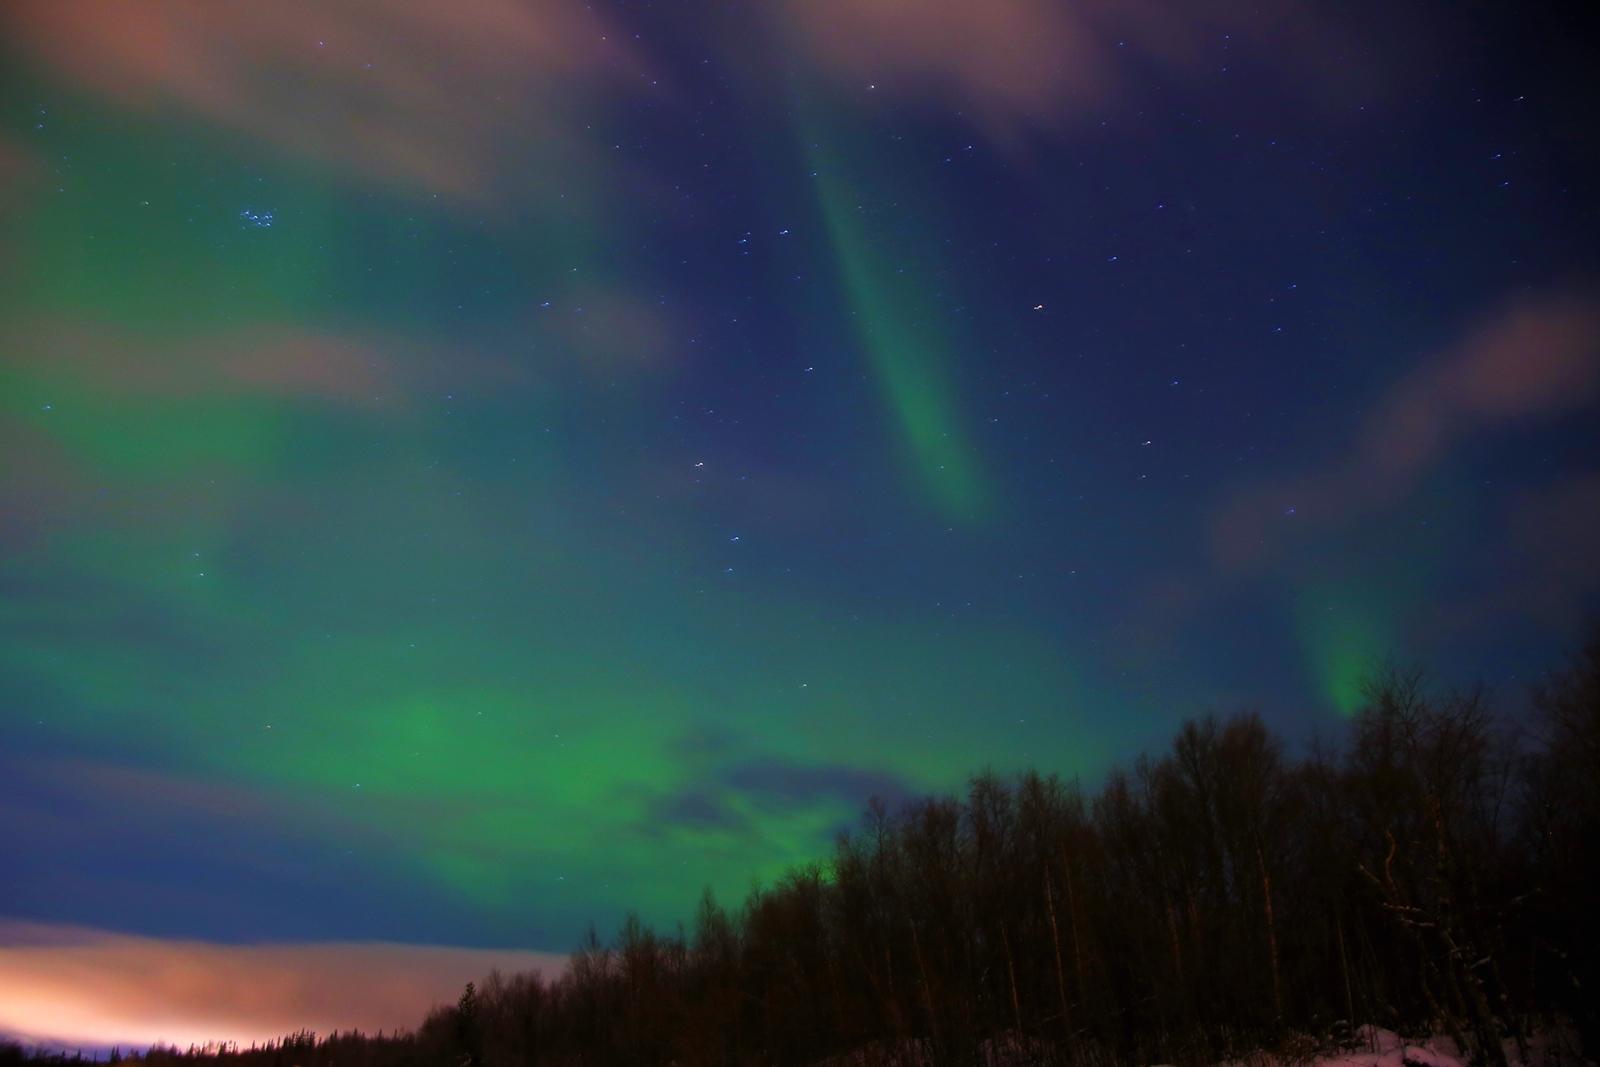 Murmansk – poate cel mai ieftin loc in care sa vezi aurora boreala